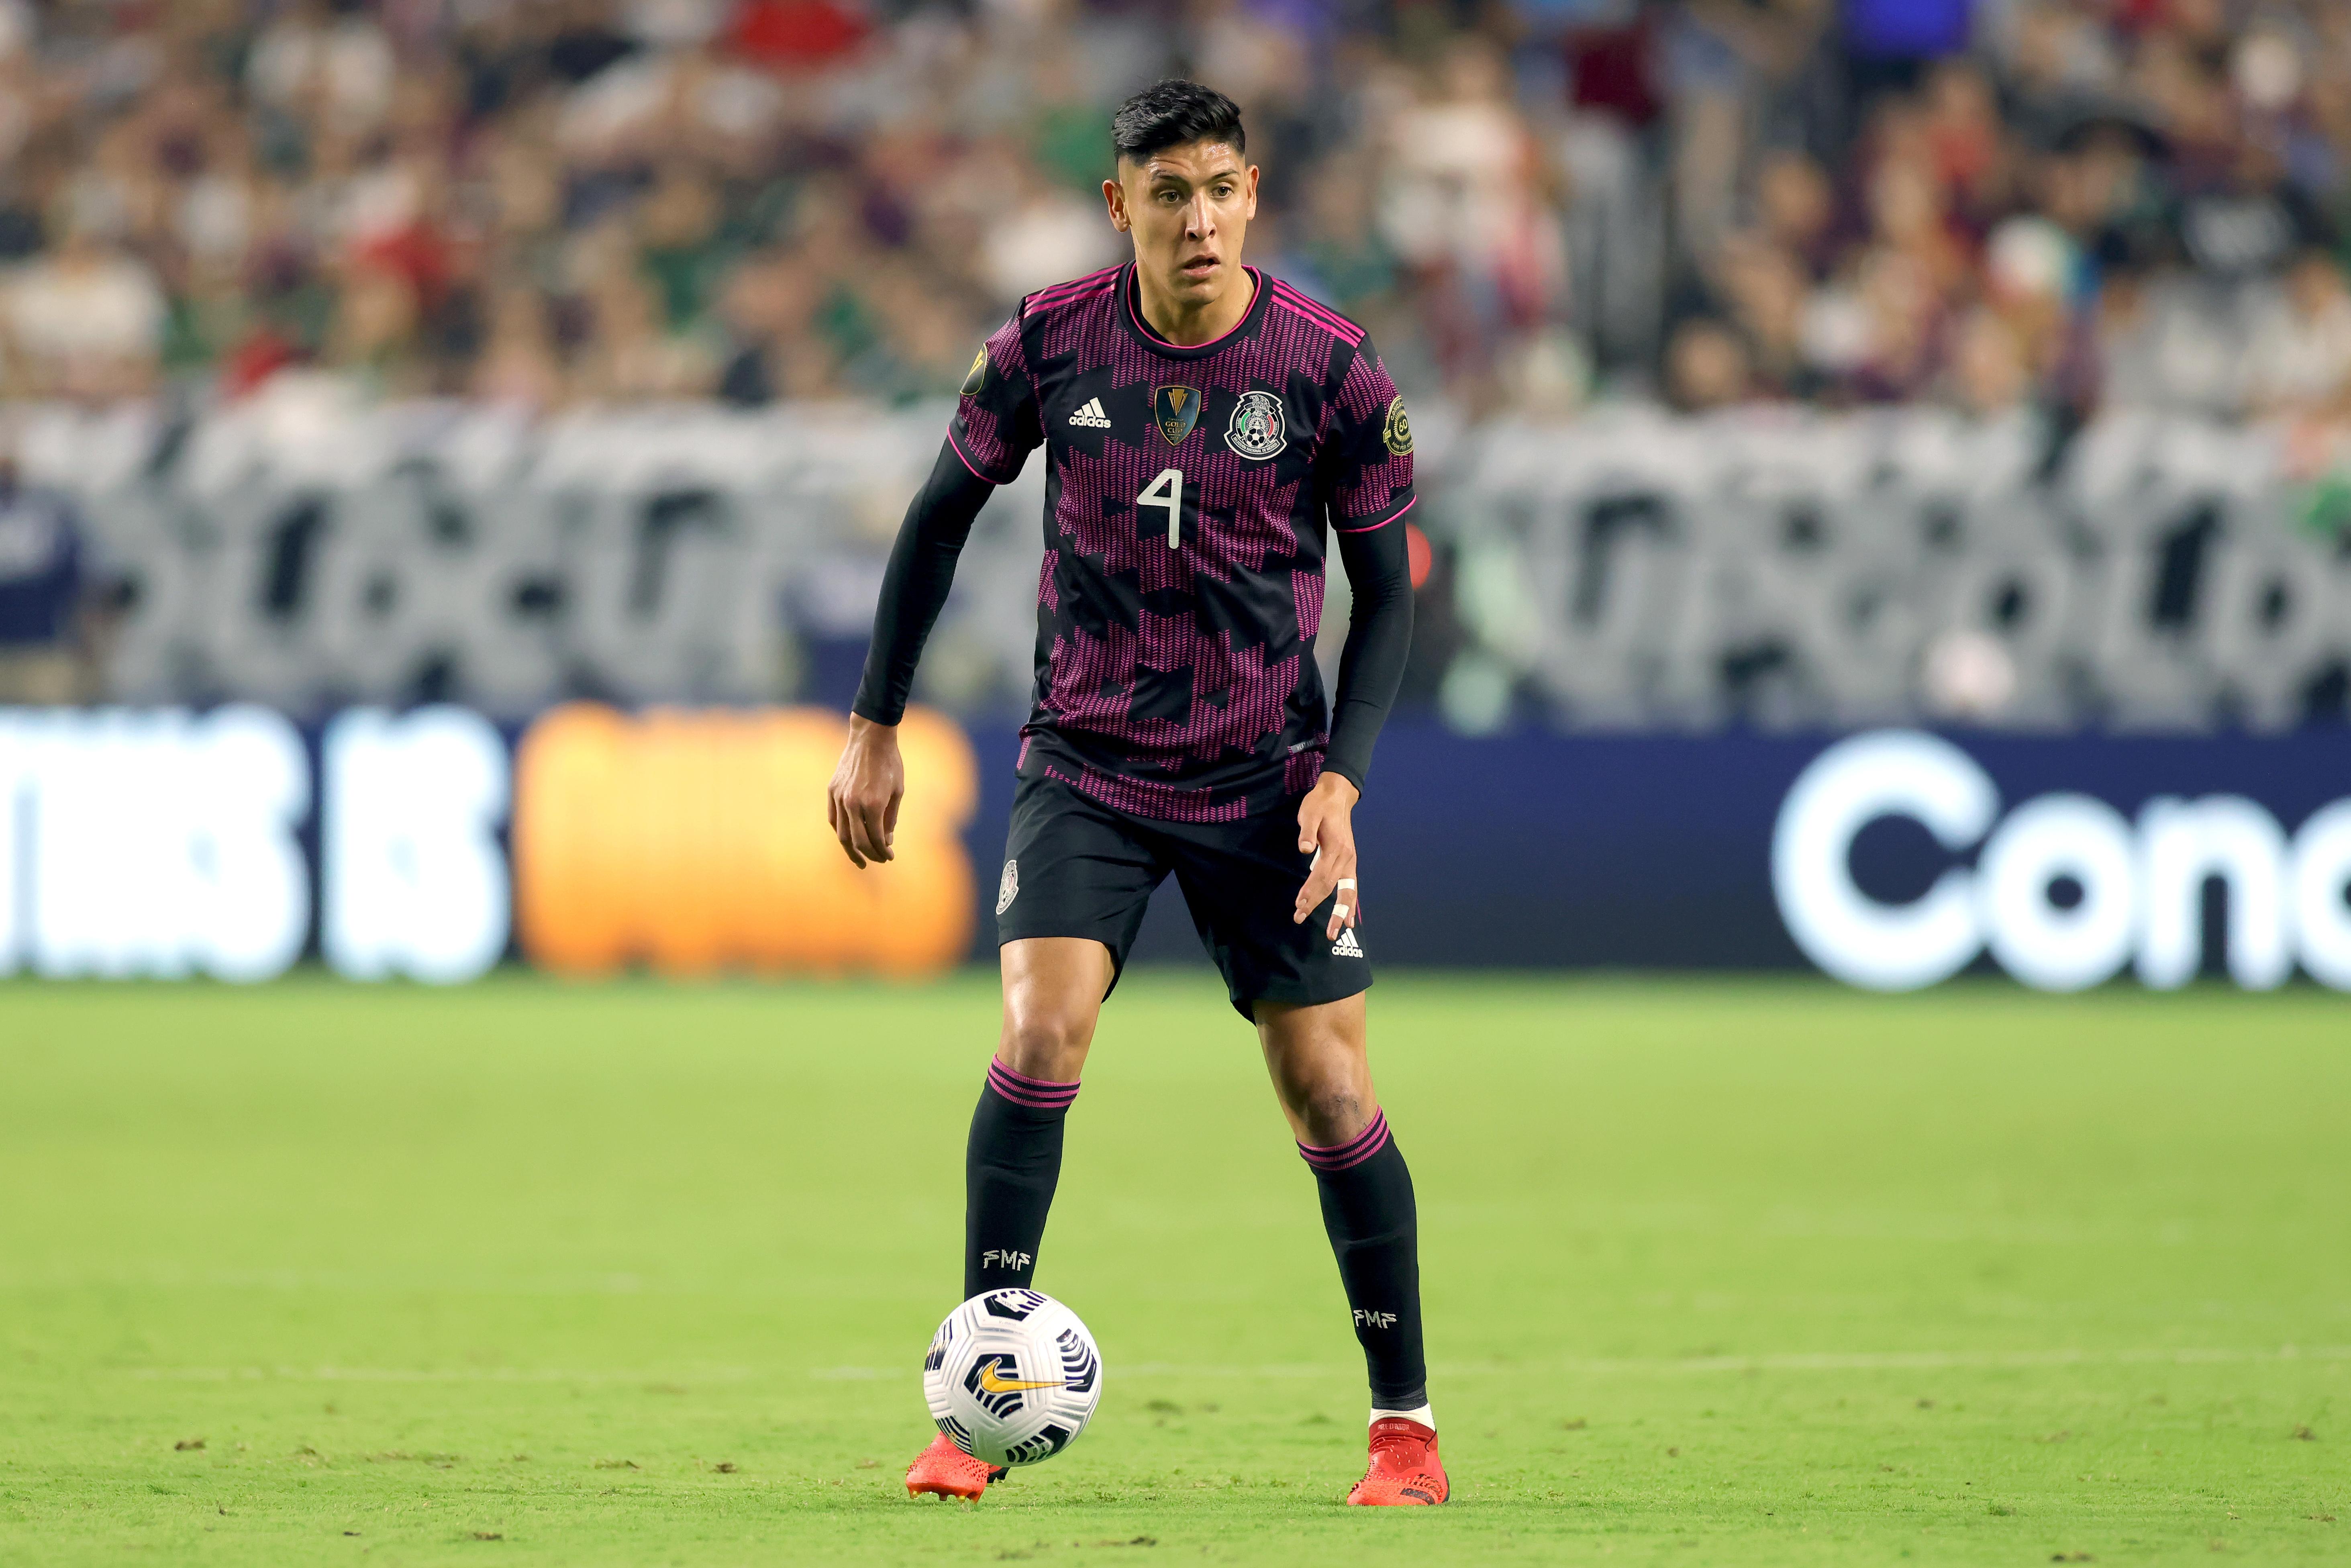 SOCCER: JUL 24 Concacaf Gold Cup Quarterfinal - Mexico v Honduras